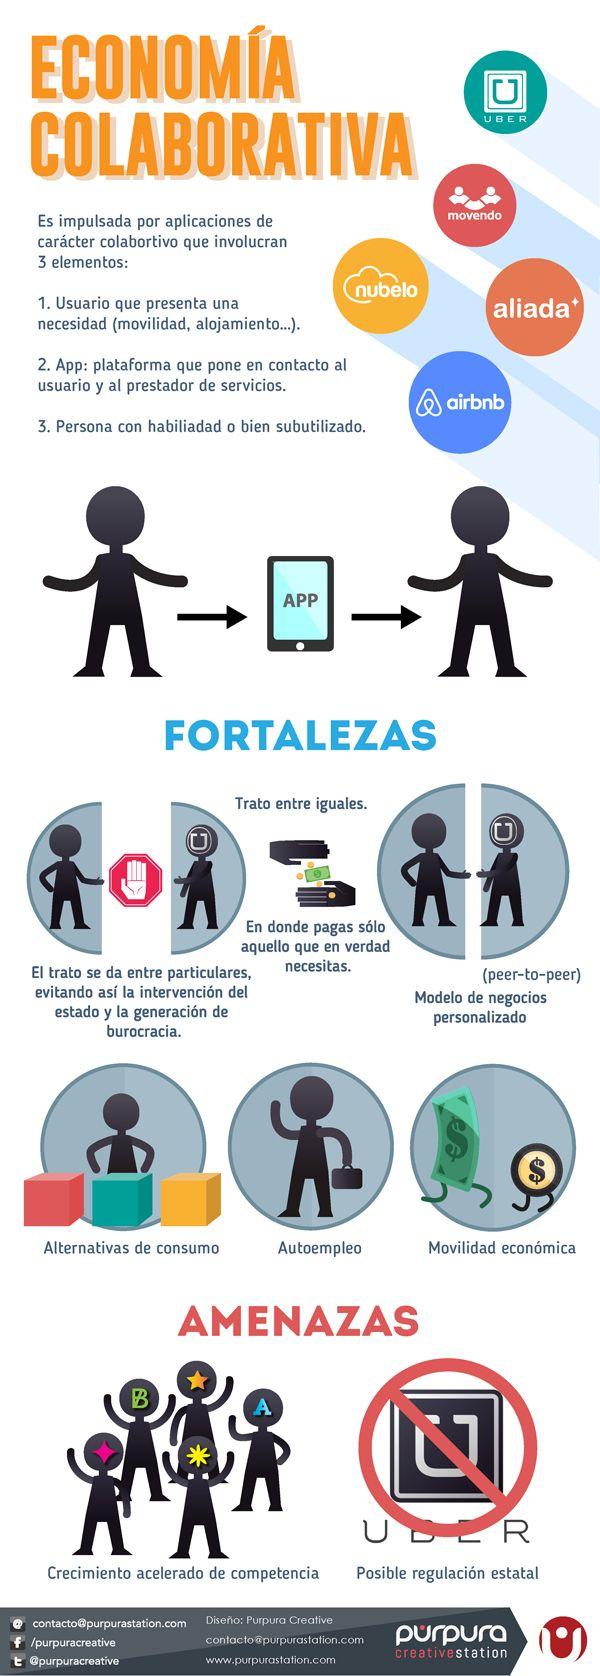 Economía colaborativa #infografia #infographic #socialmedia